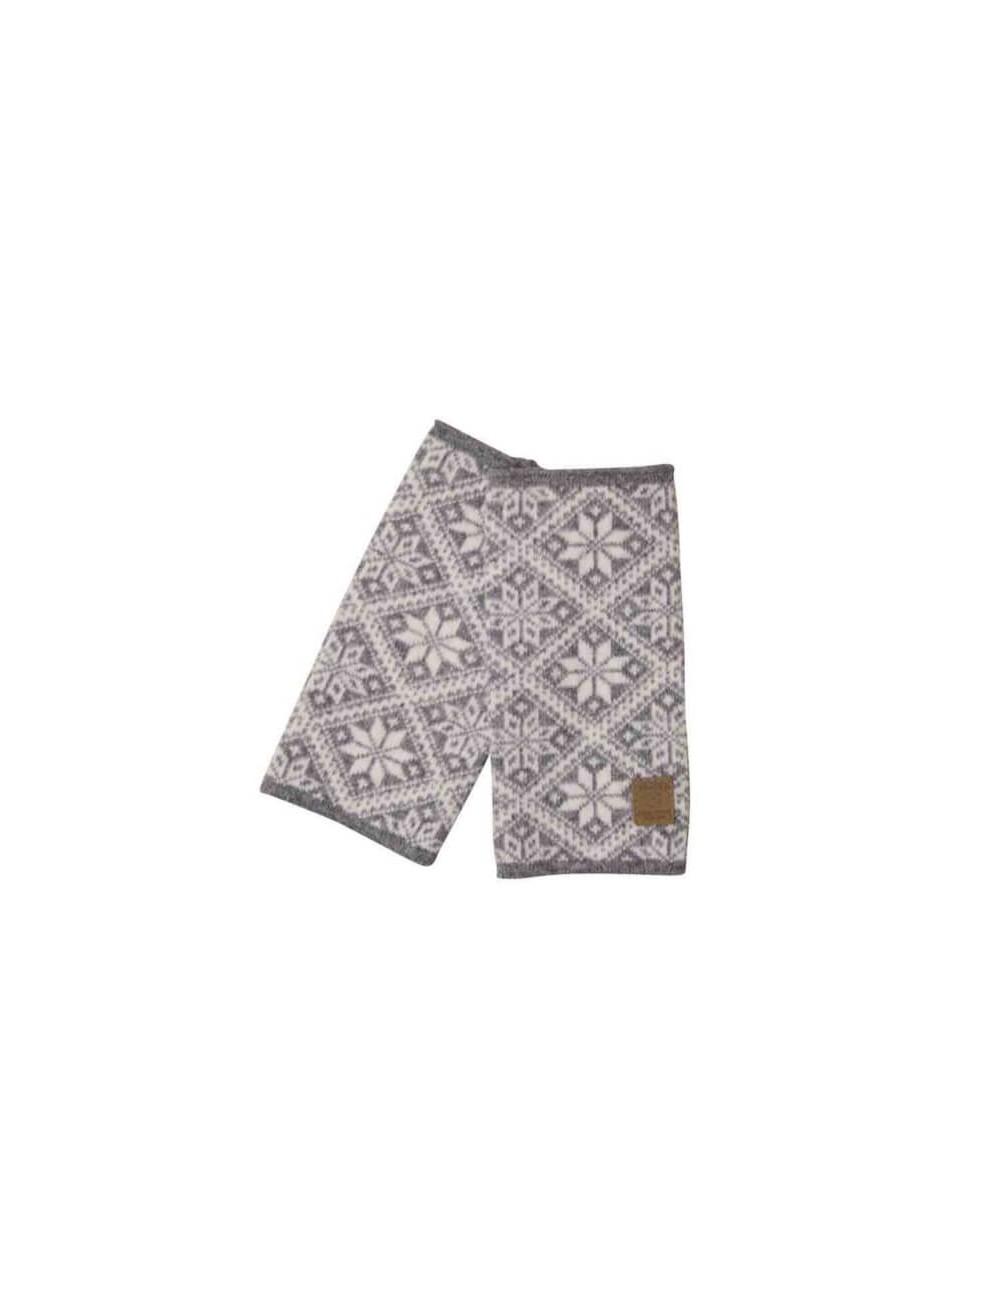 Ivanhoe gebreide handwarmer van wol Elsie Grey Marl - One Size - Grijs